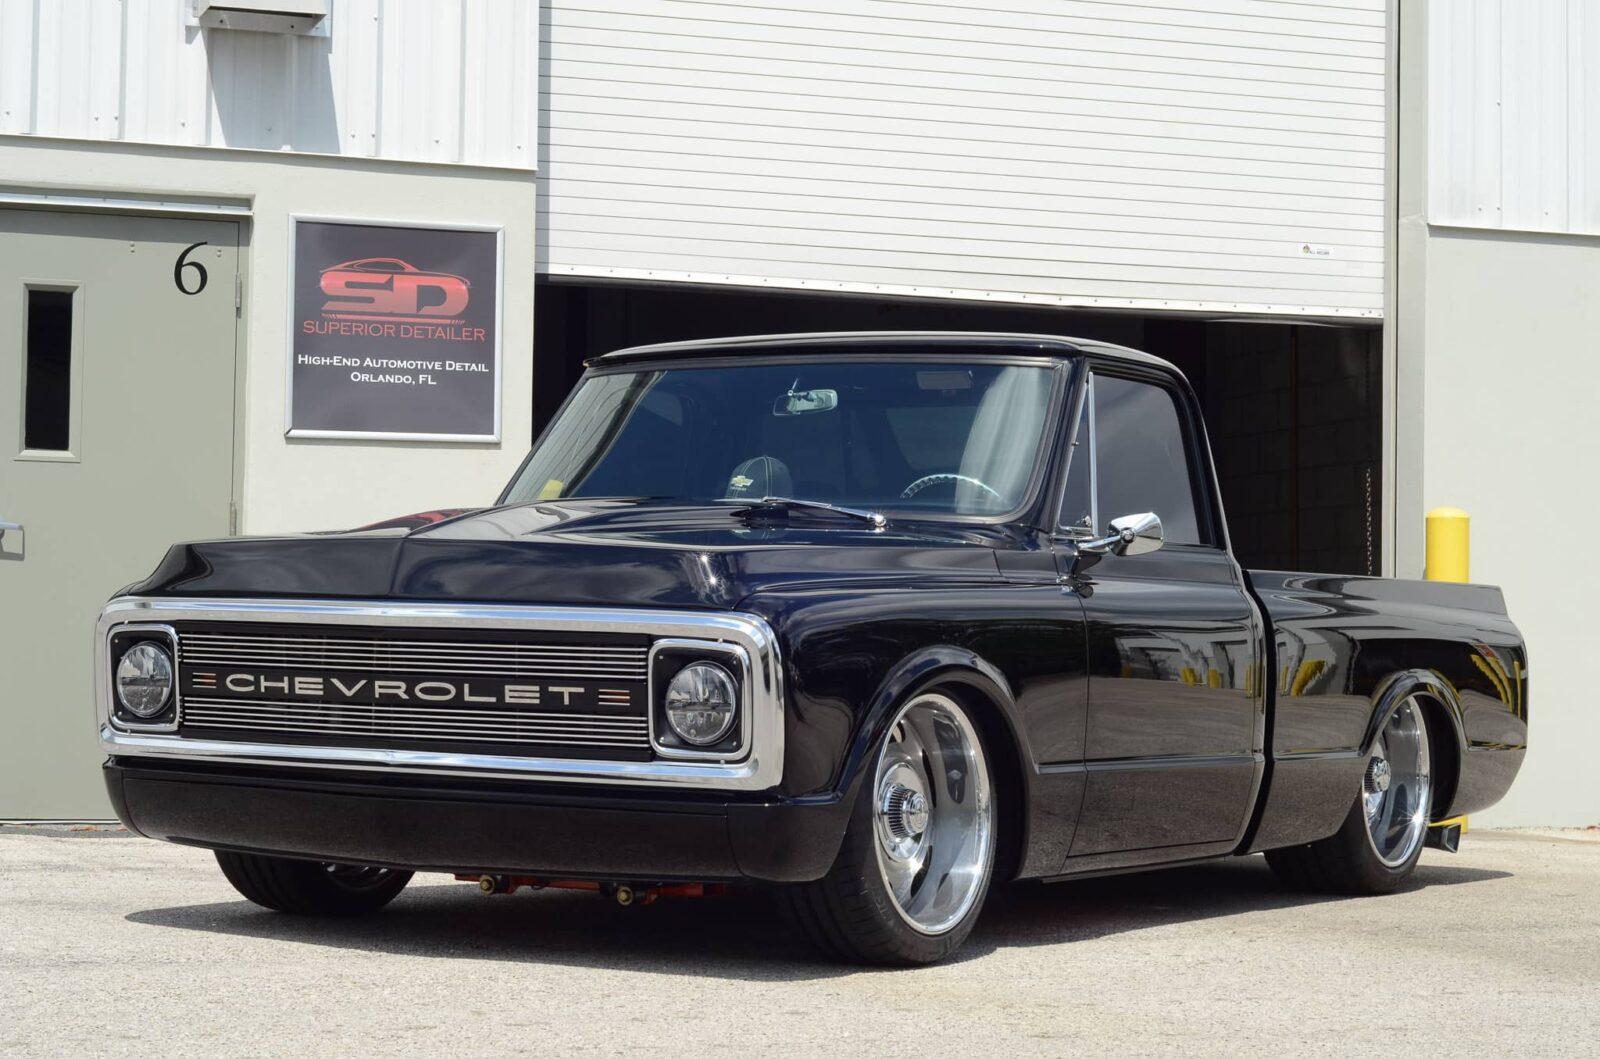 Chevy C10 Custom, Paint Correction